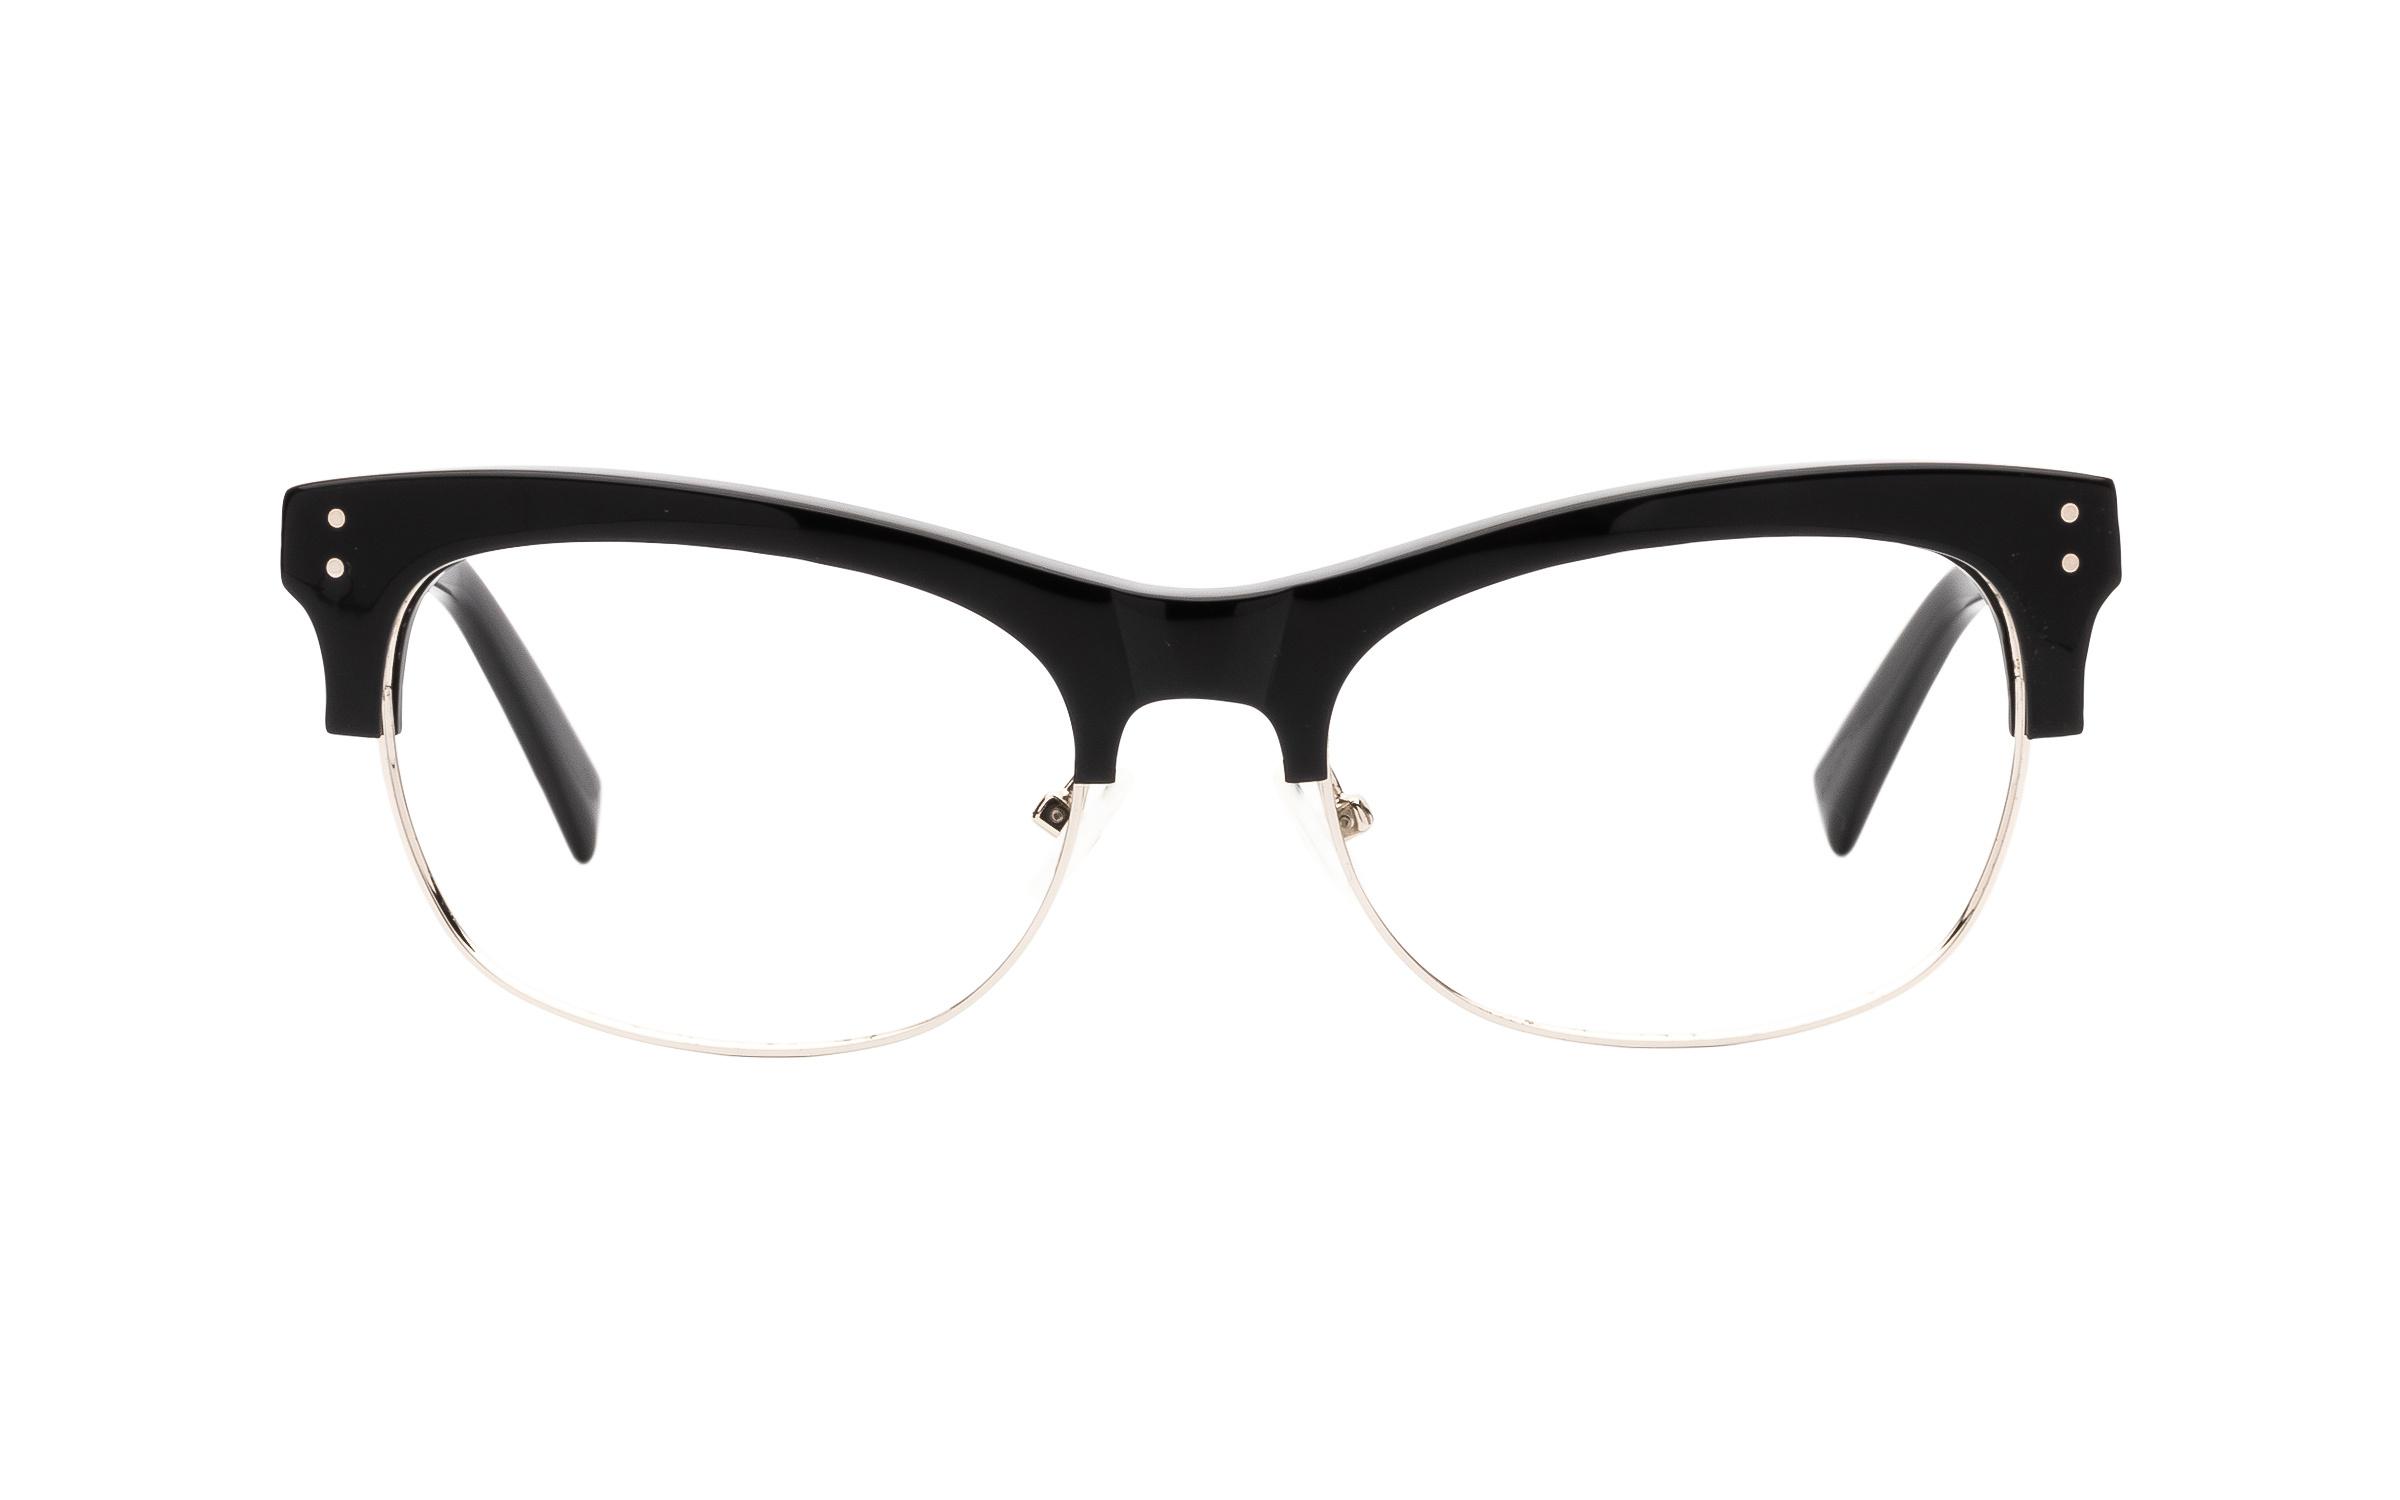 http://www.coastal.com/ - Joseph Marc 4115 Silver (55) Eyeglasses and Frame in Black | Acetate/Plastic – Online Coastal